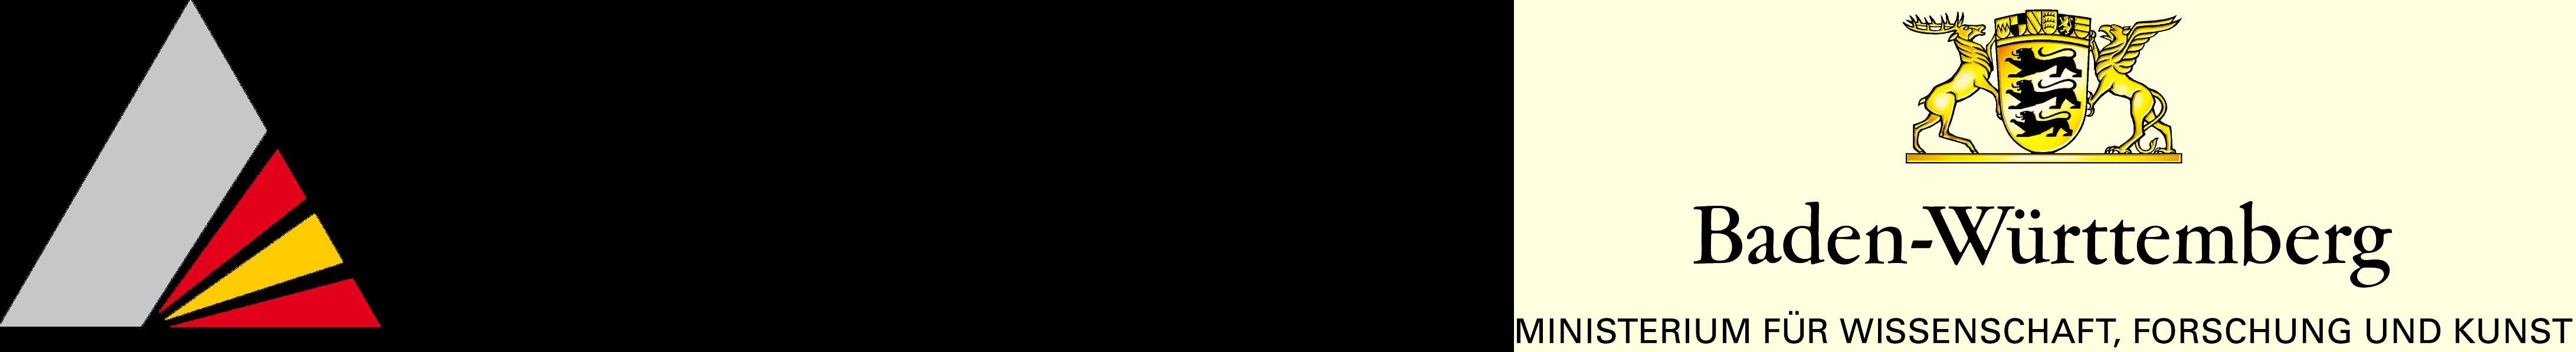 logos_beide_sponsoren